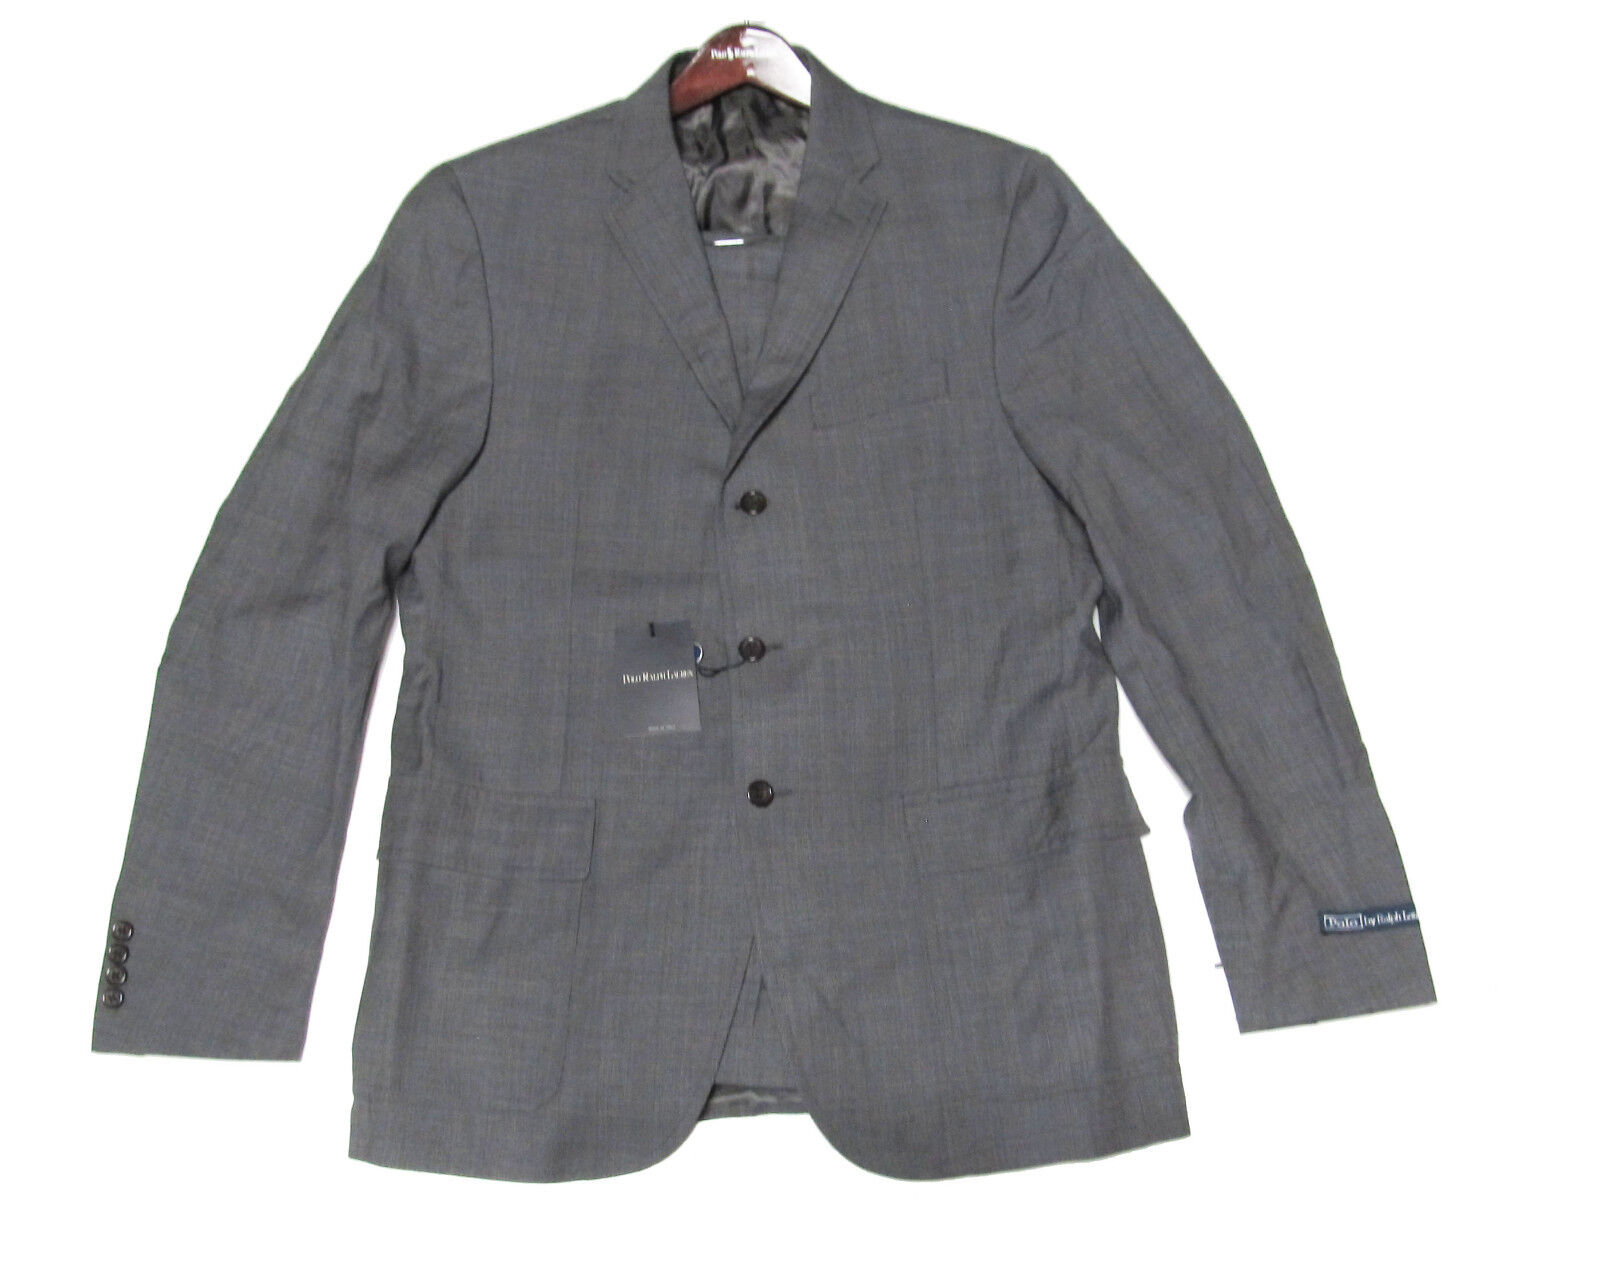 1,650 Polo Ralph Lauren  Herren  Grau Harvard Slim Custom Fit Wool Suit 42L